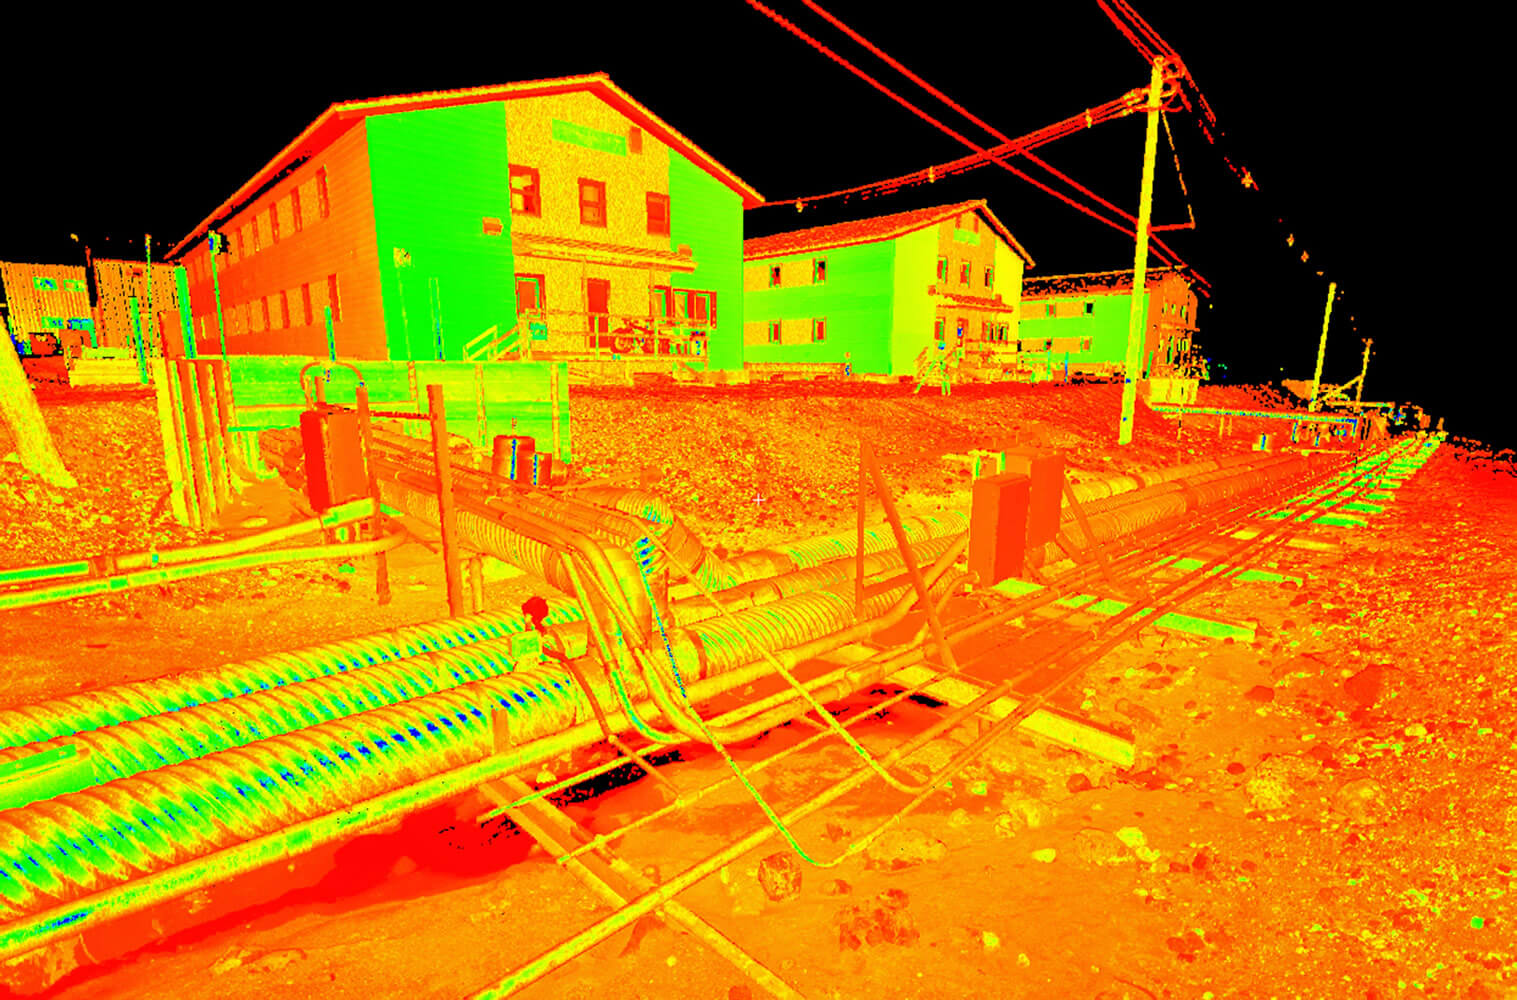 Merrick_McMurdo-Image3